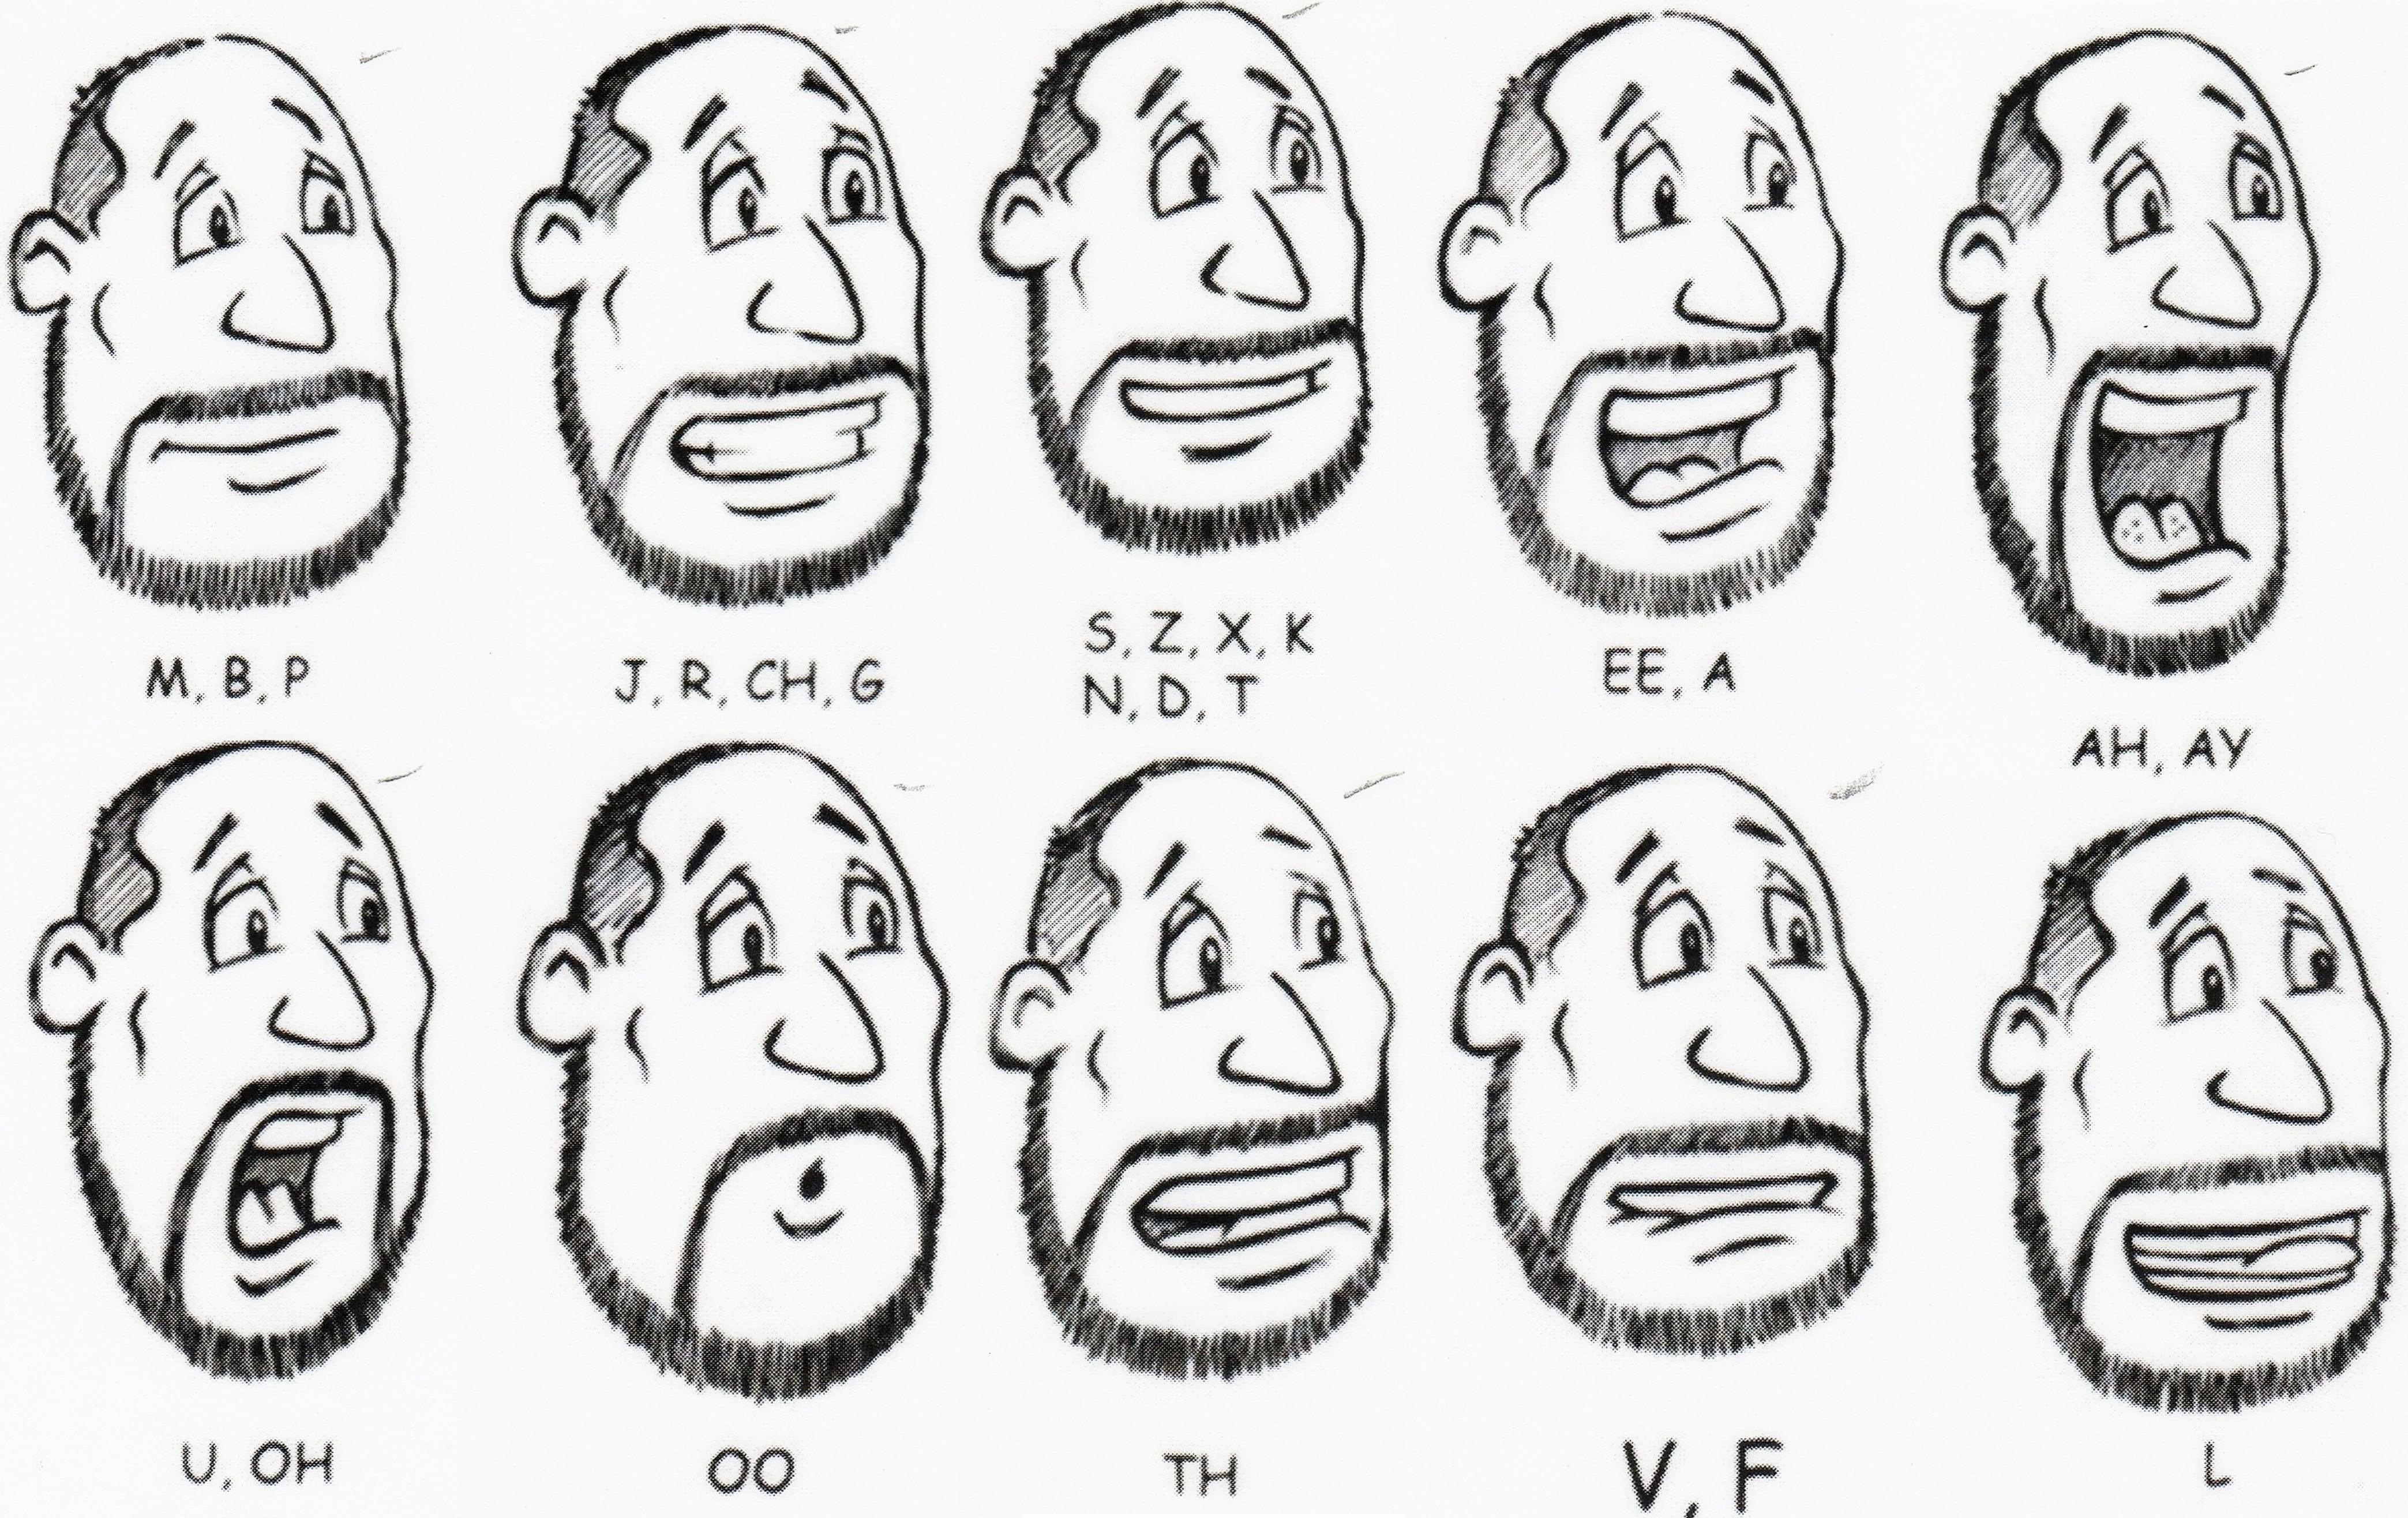 Hattie Croucher Animation Principles